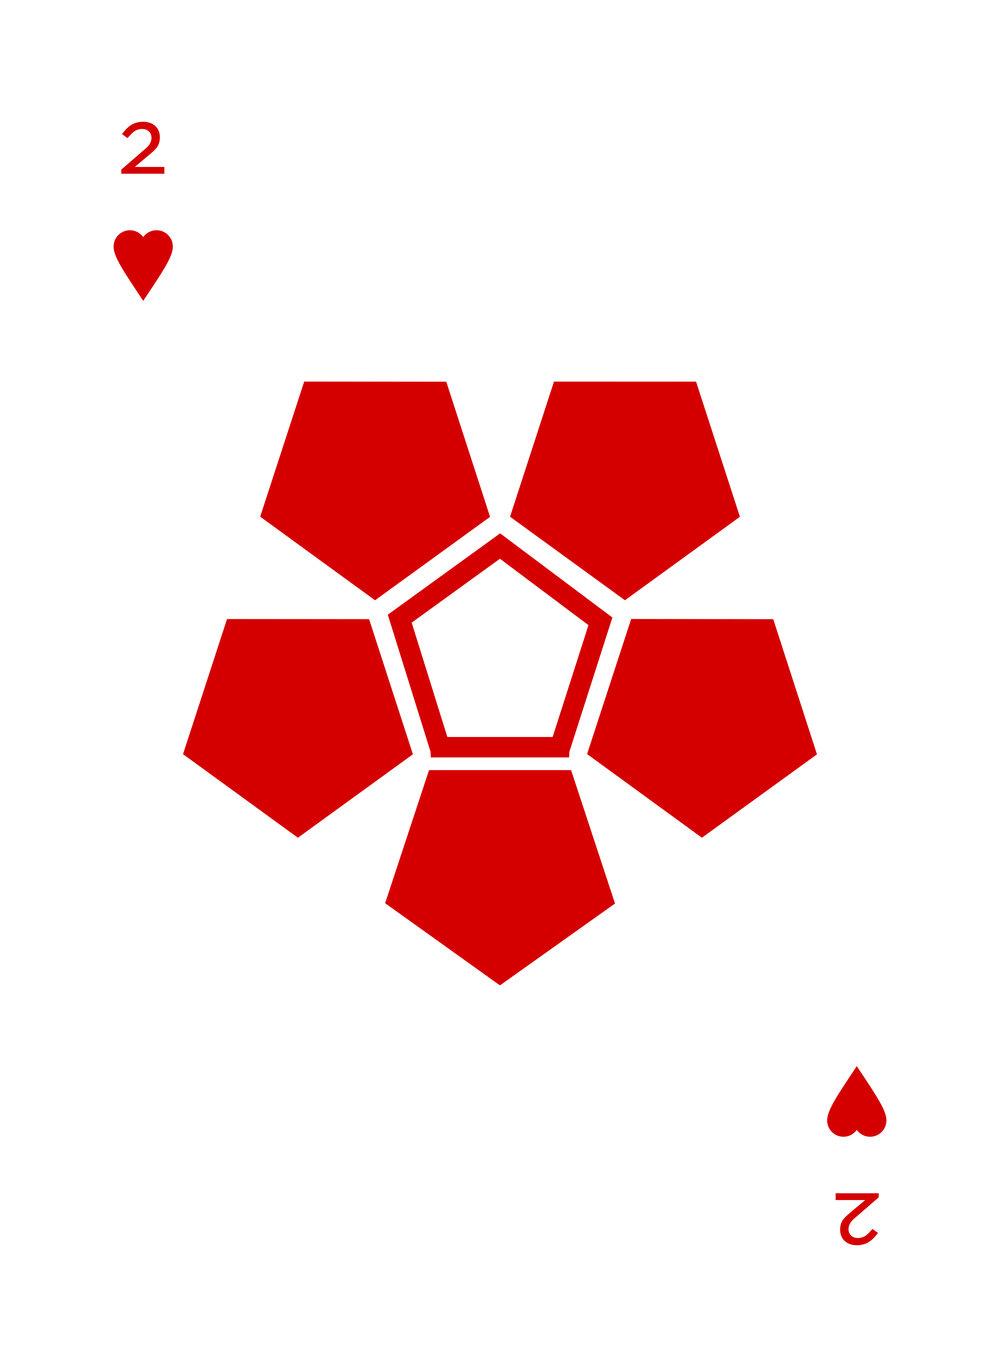 52_2__0024_Hearts_2.jpg